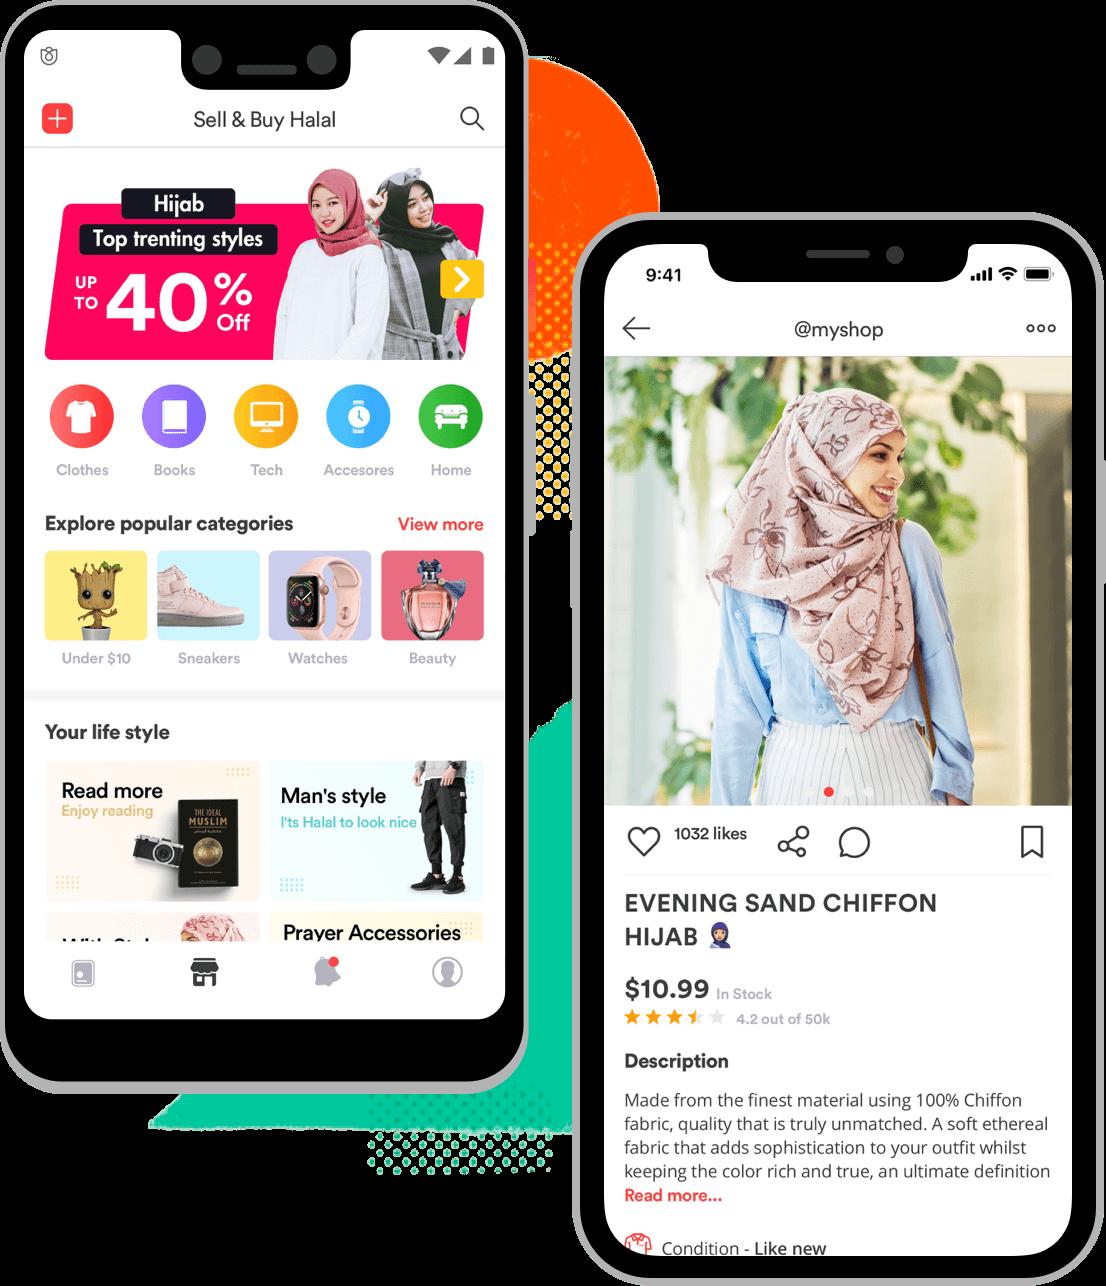 Buy and sell halal